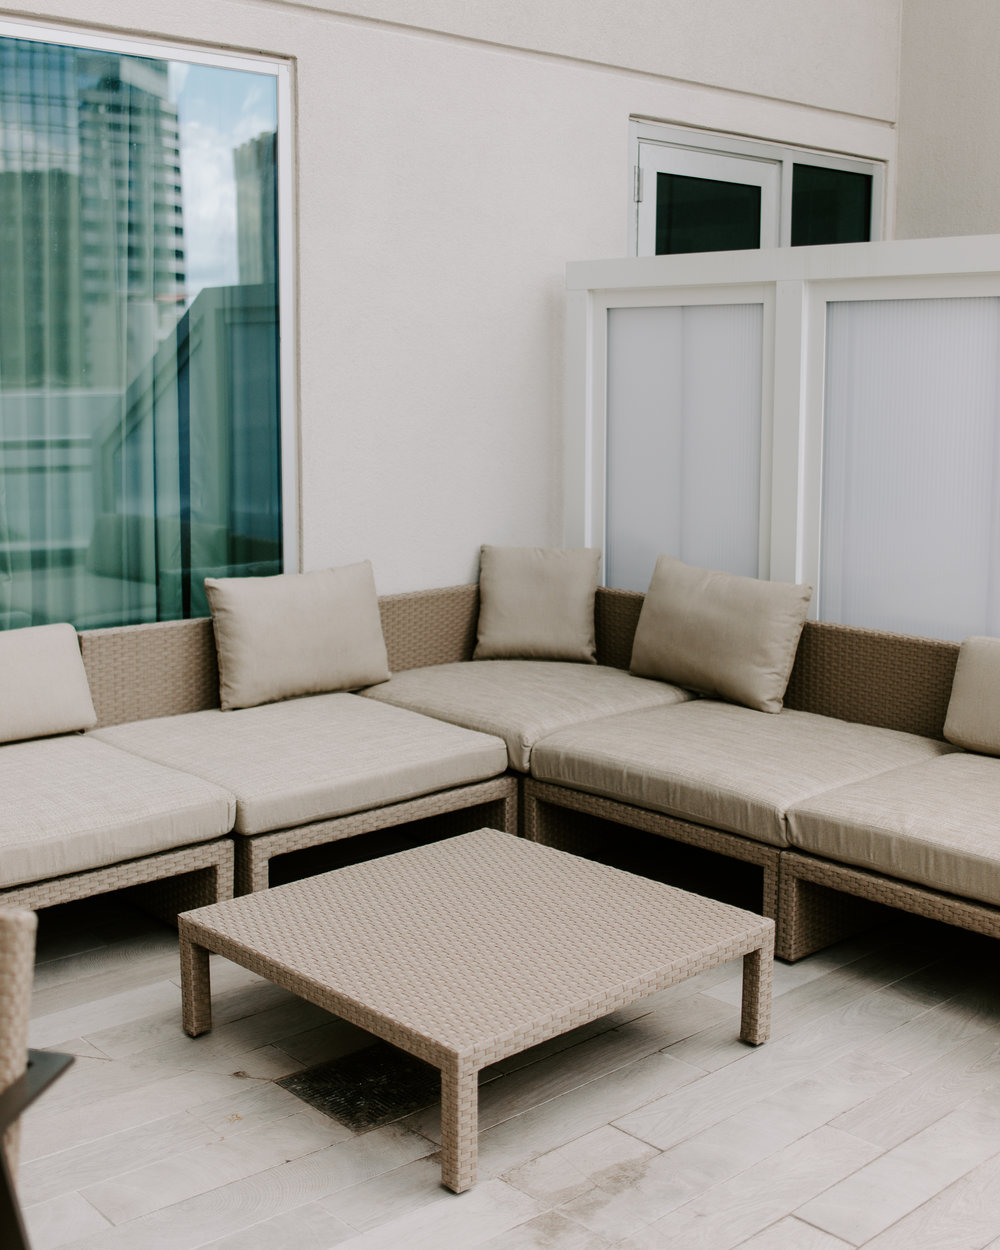 Balcony3 (1).jpg